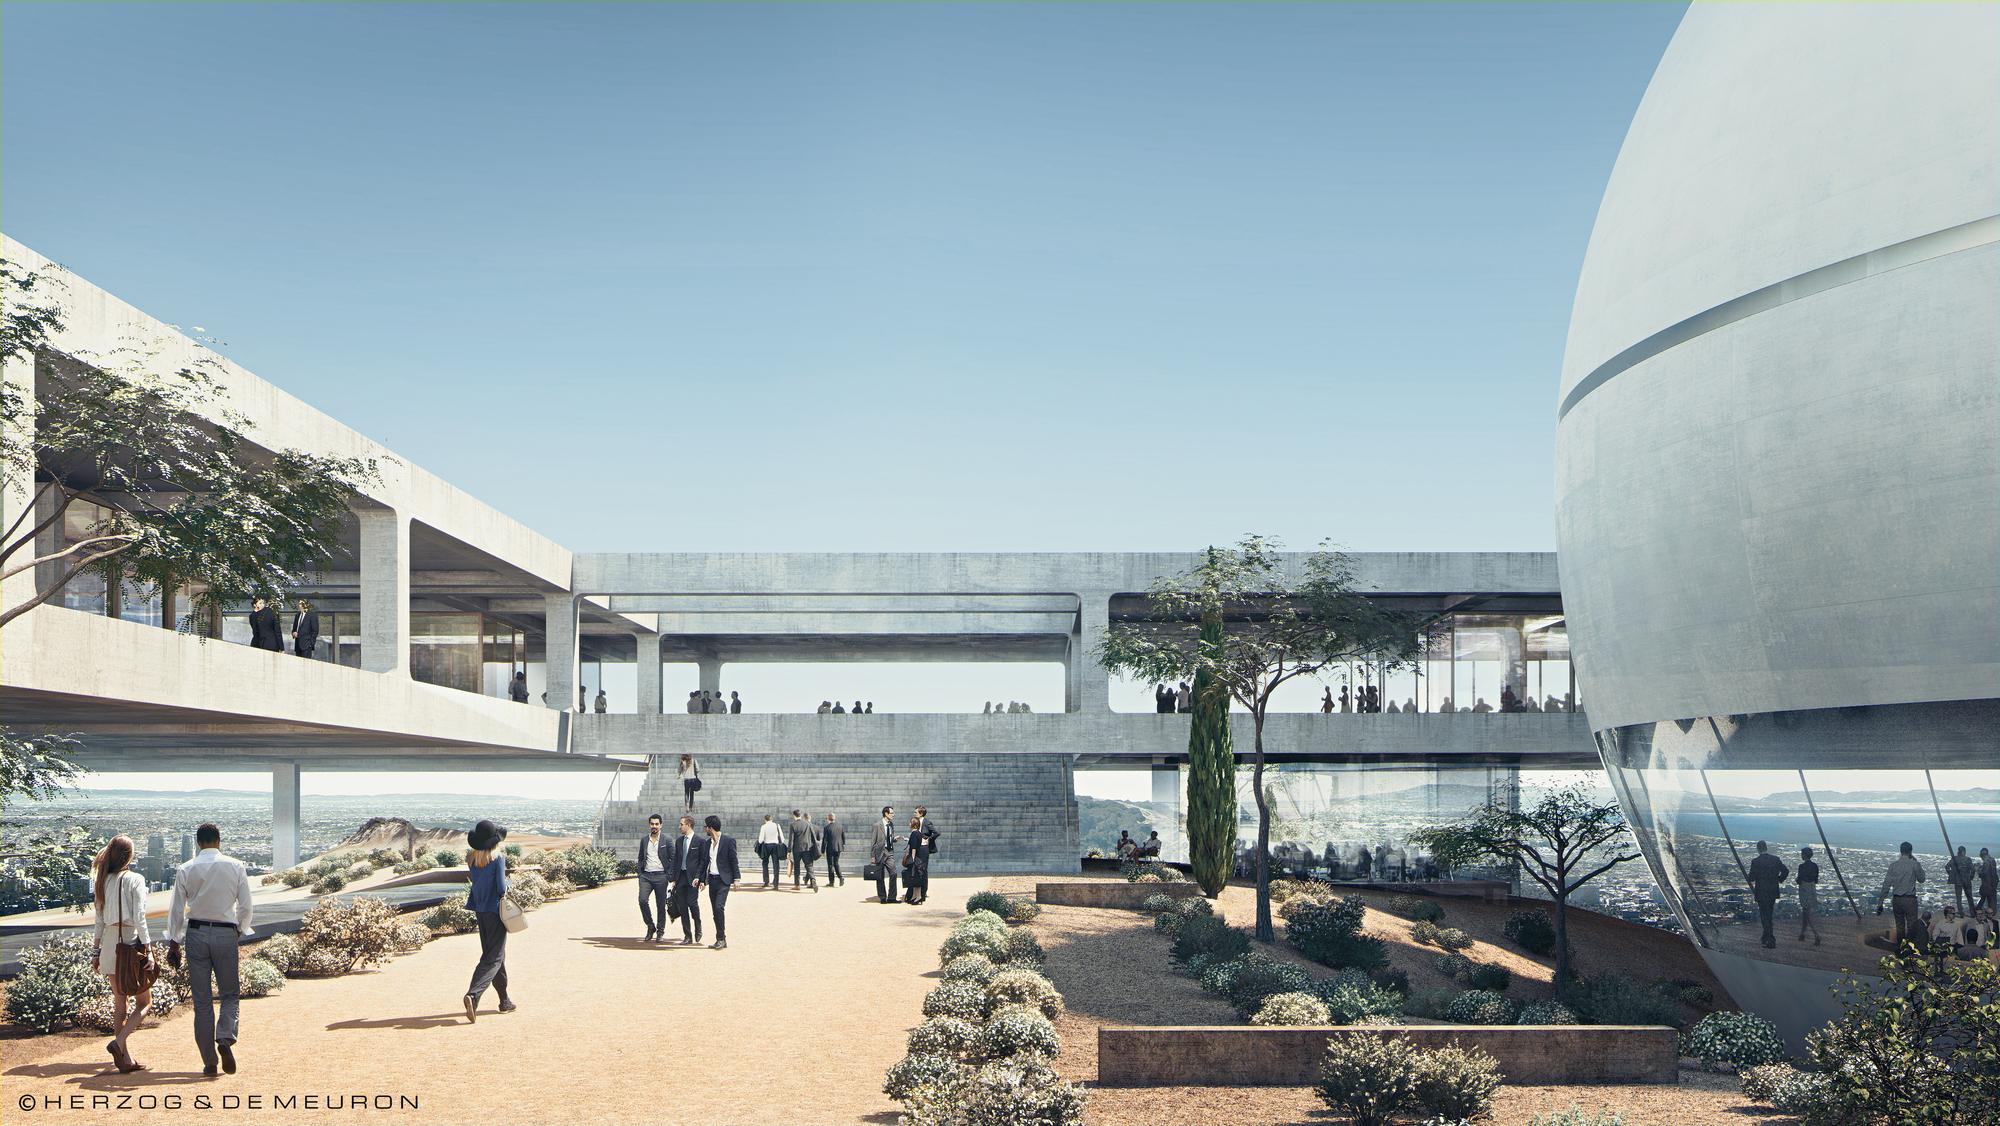 Herzog U0026 De Meuron Designs New Campus For Berggruen Institute In The Los  Angeles Hills,